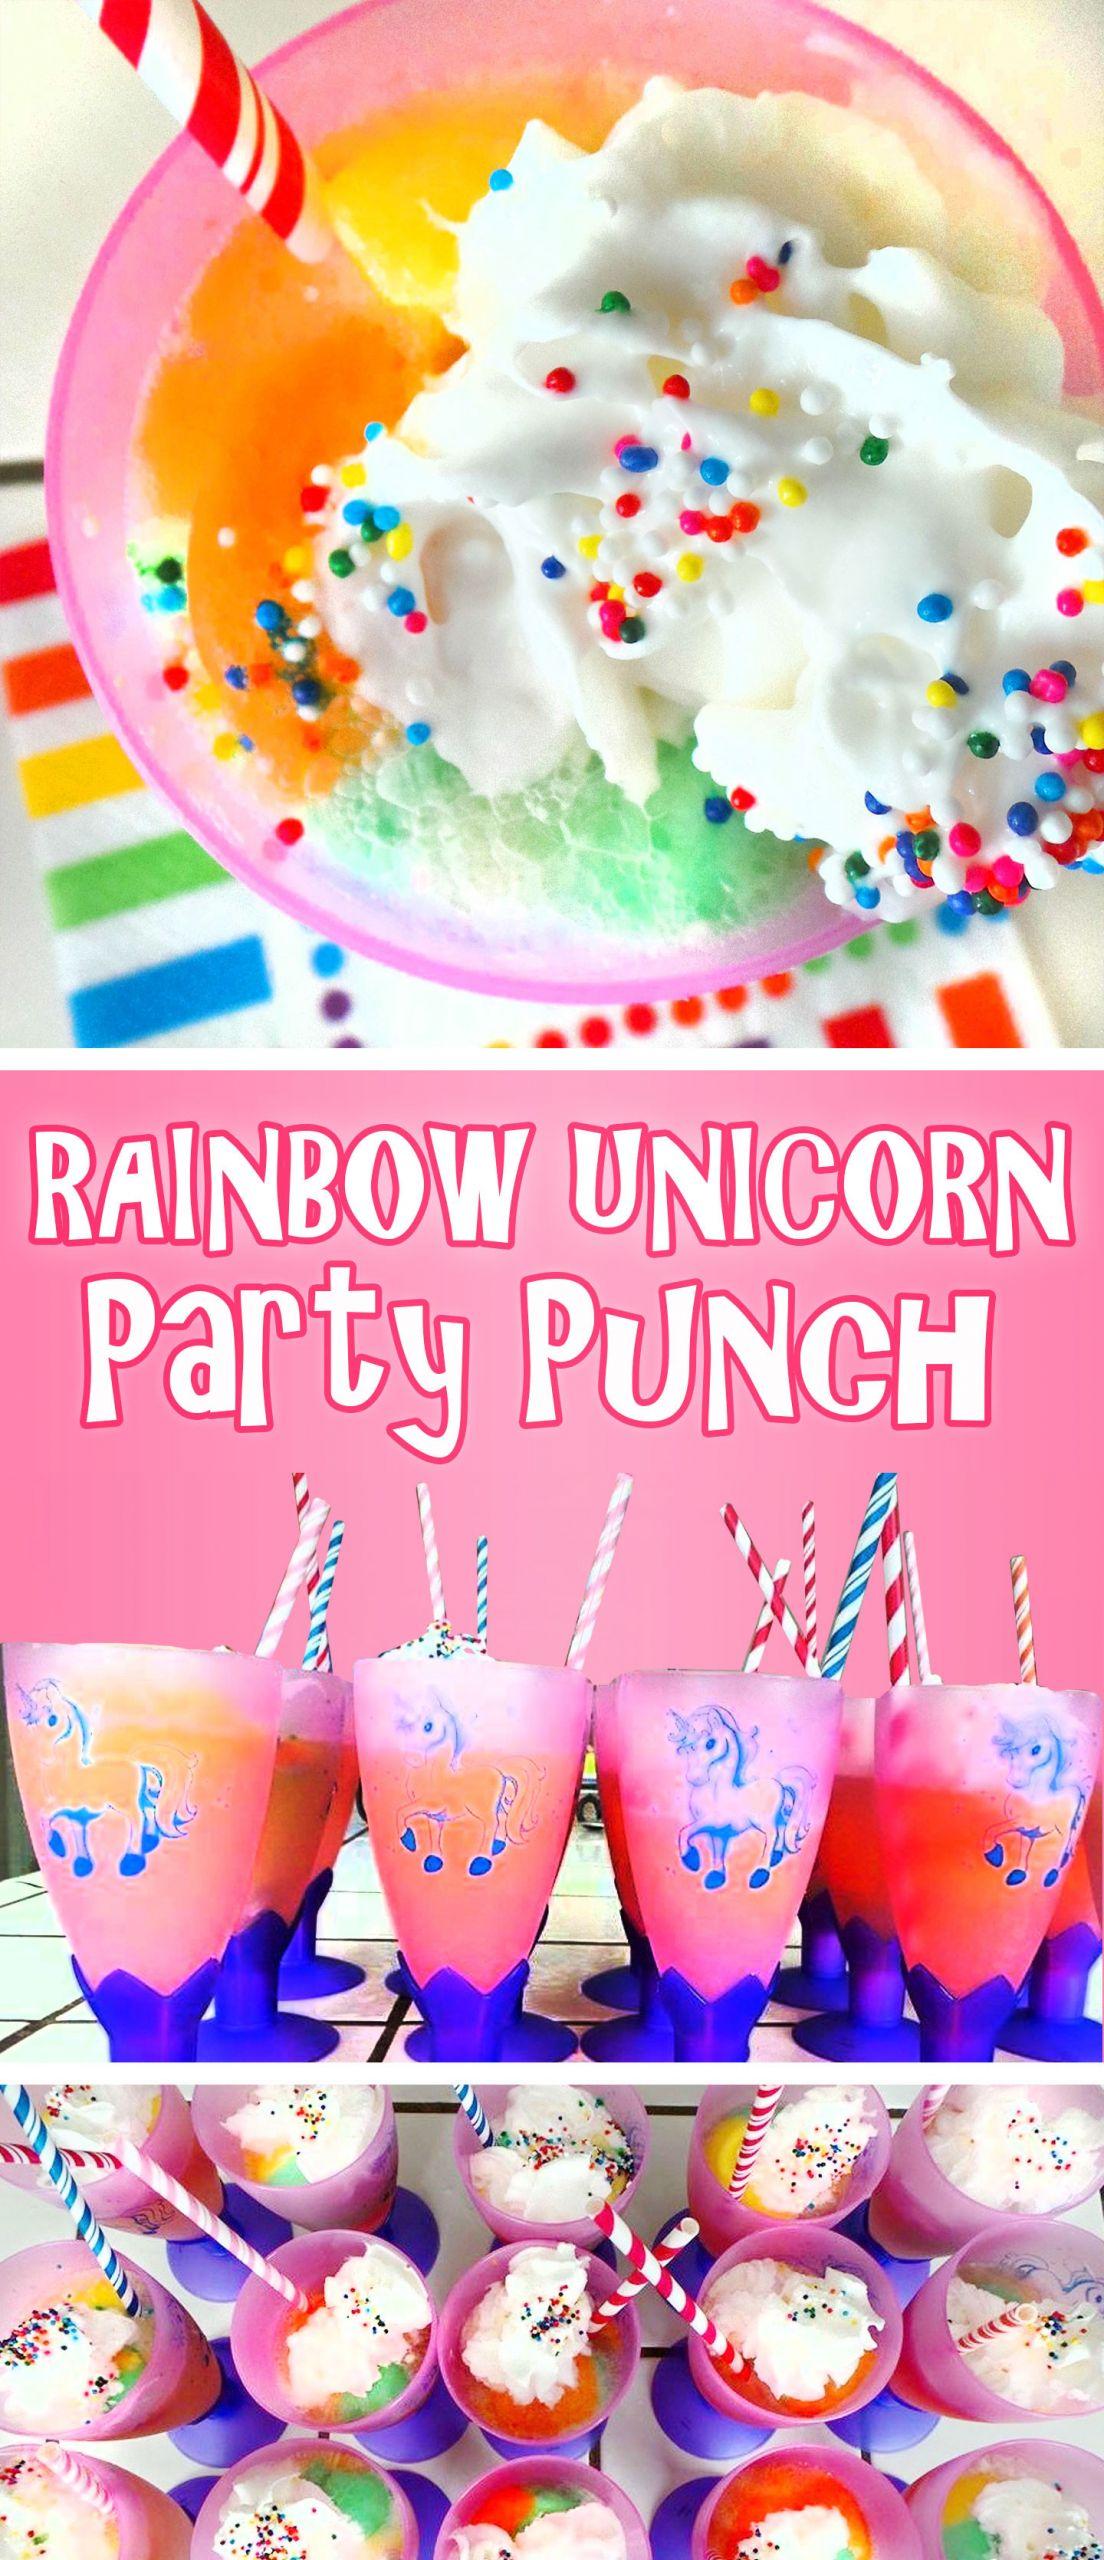 Unicorn And Rainbow Birthday Party Ideas  Rainbow Unicorn Party Punch